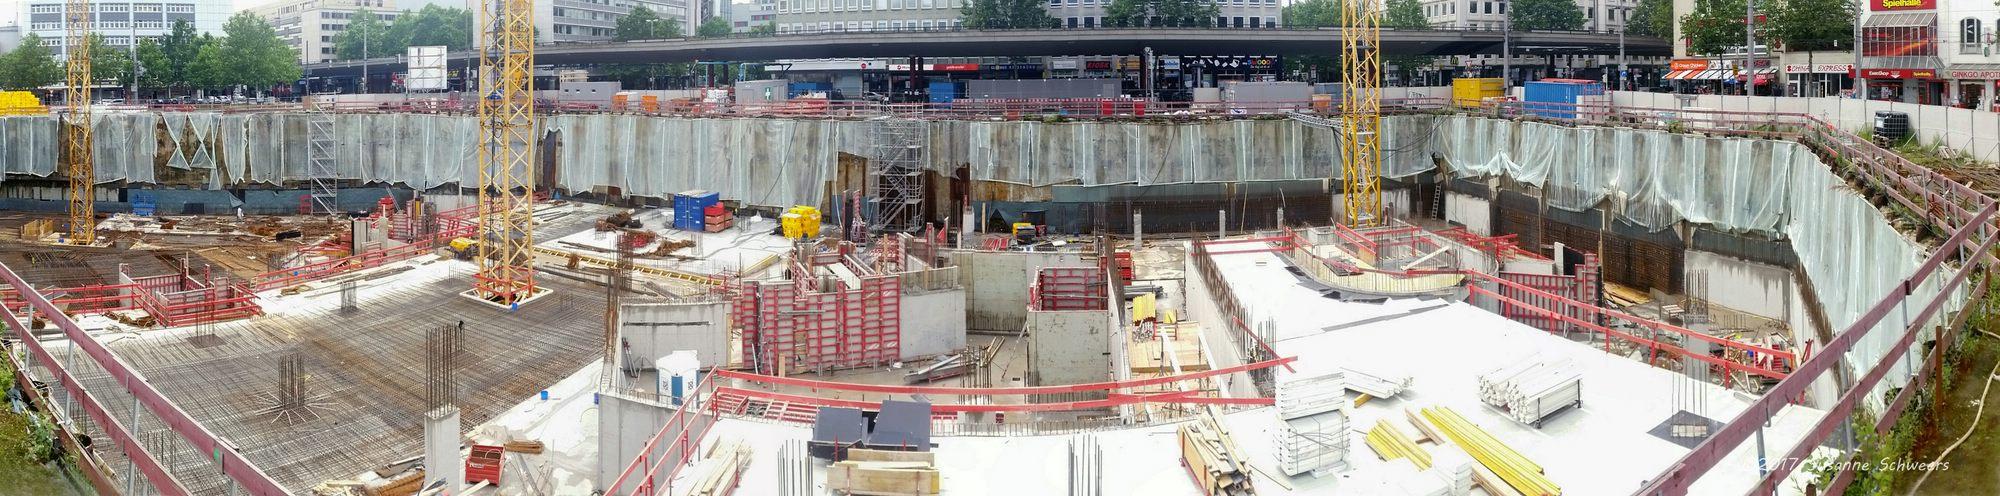 Baustelle Bahnhofsplatz 134